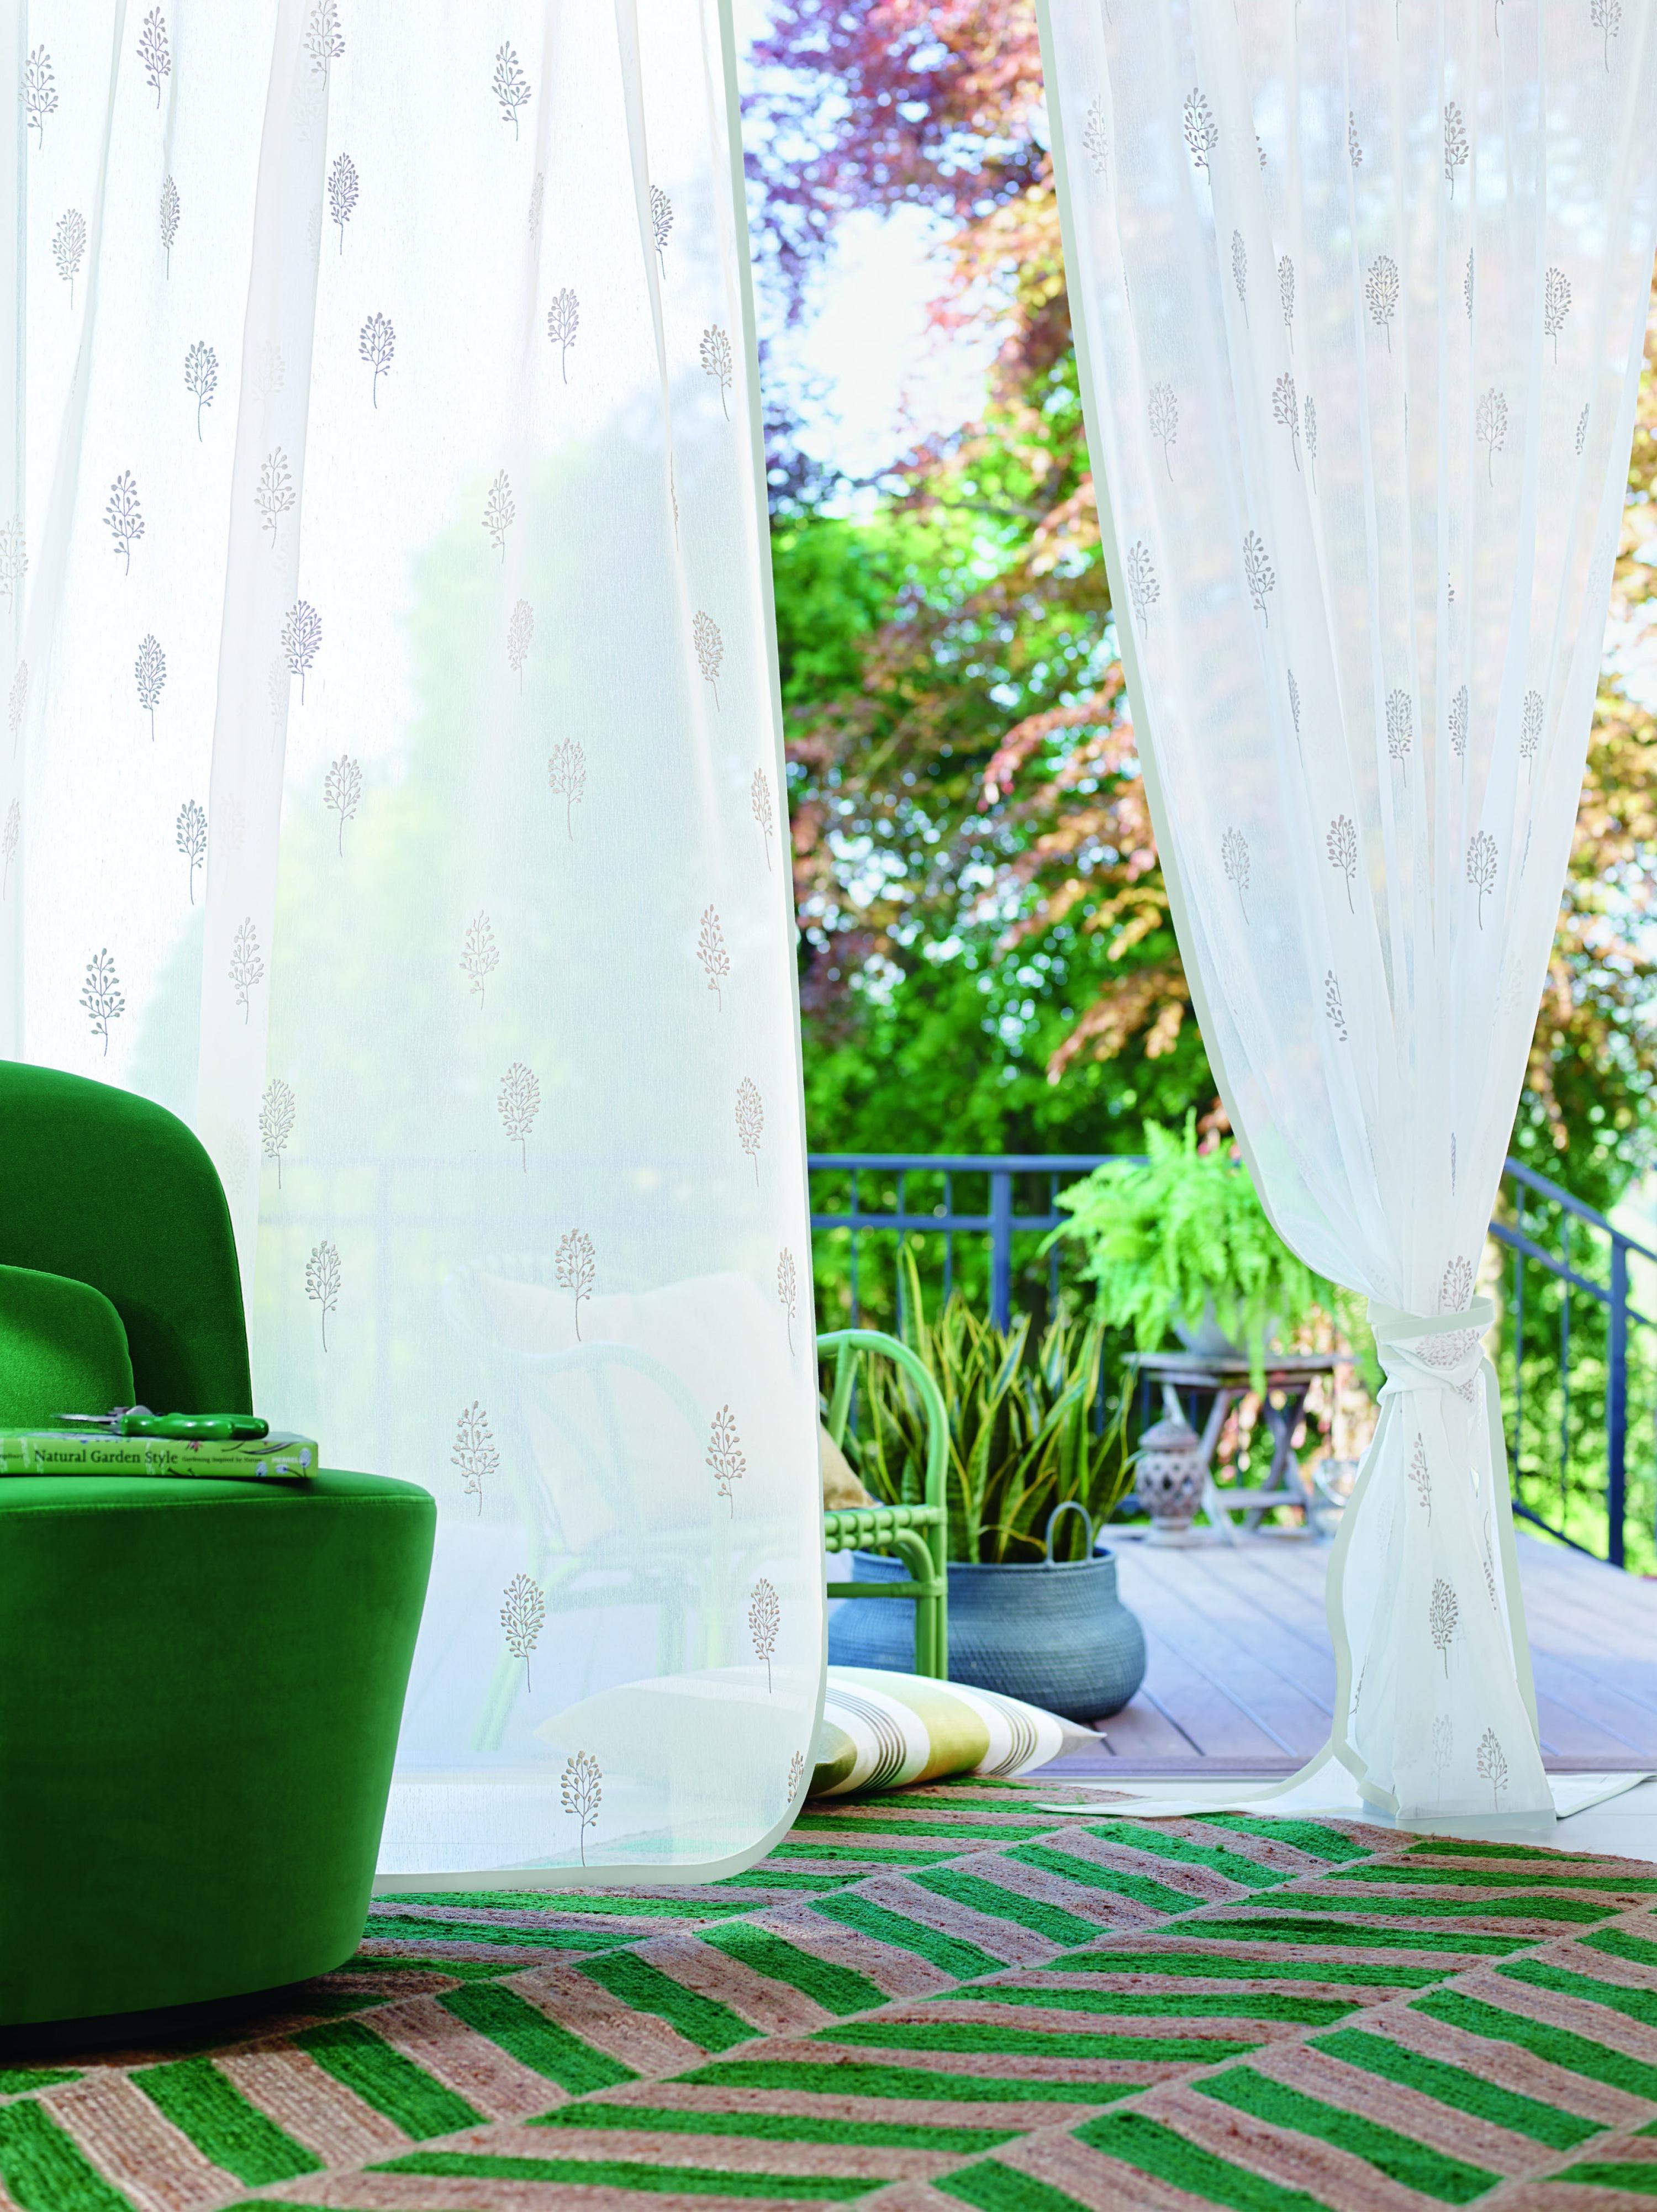 Elegant Gardinenstoffe Landhaus Ideen